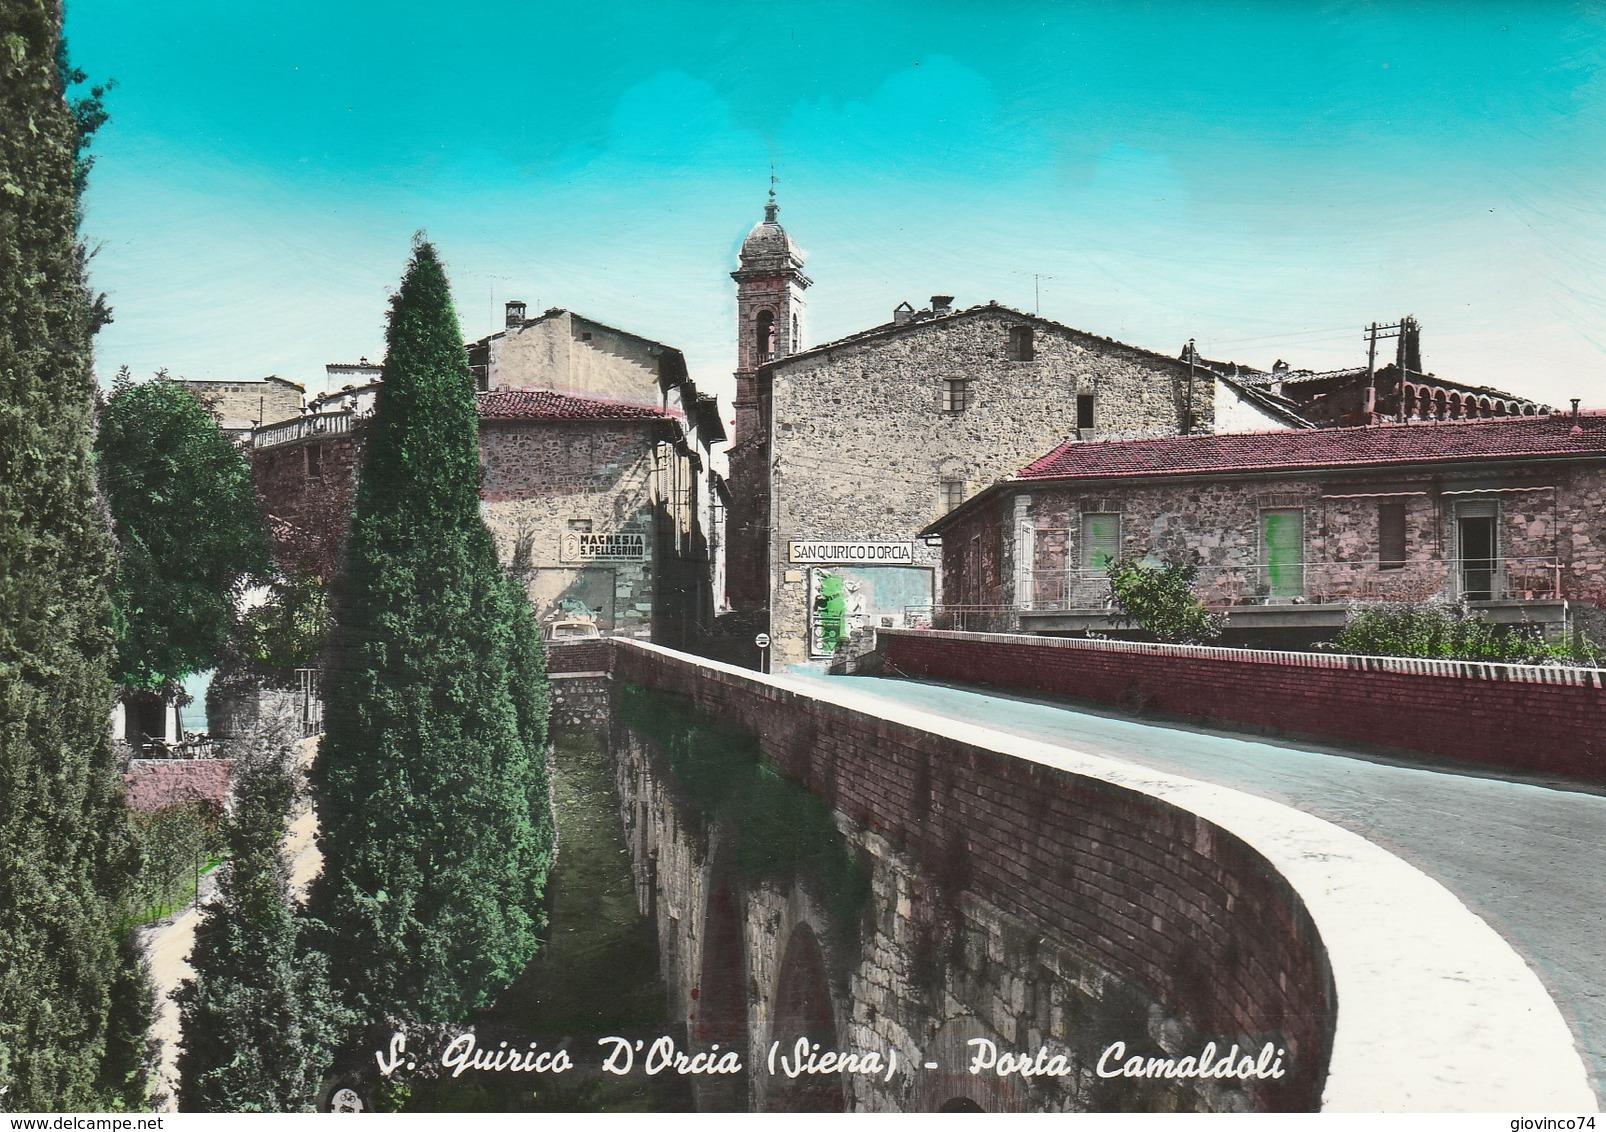 SIENA - S. QUIRICO D'ORCIA - PORTA CAMALDOLI........F7 - Siena